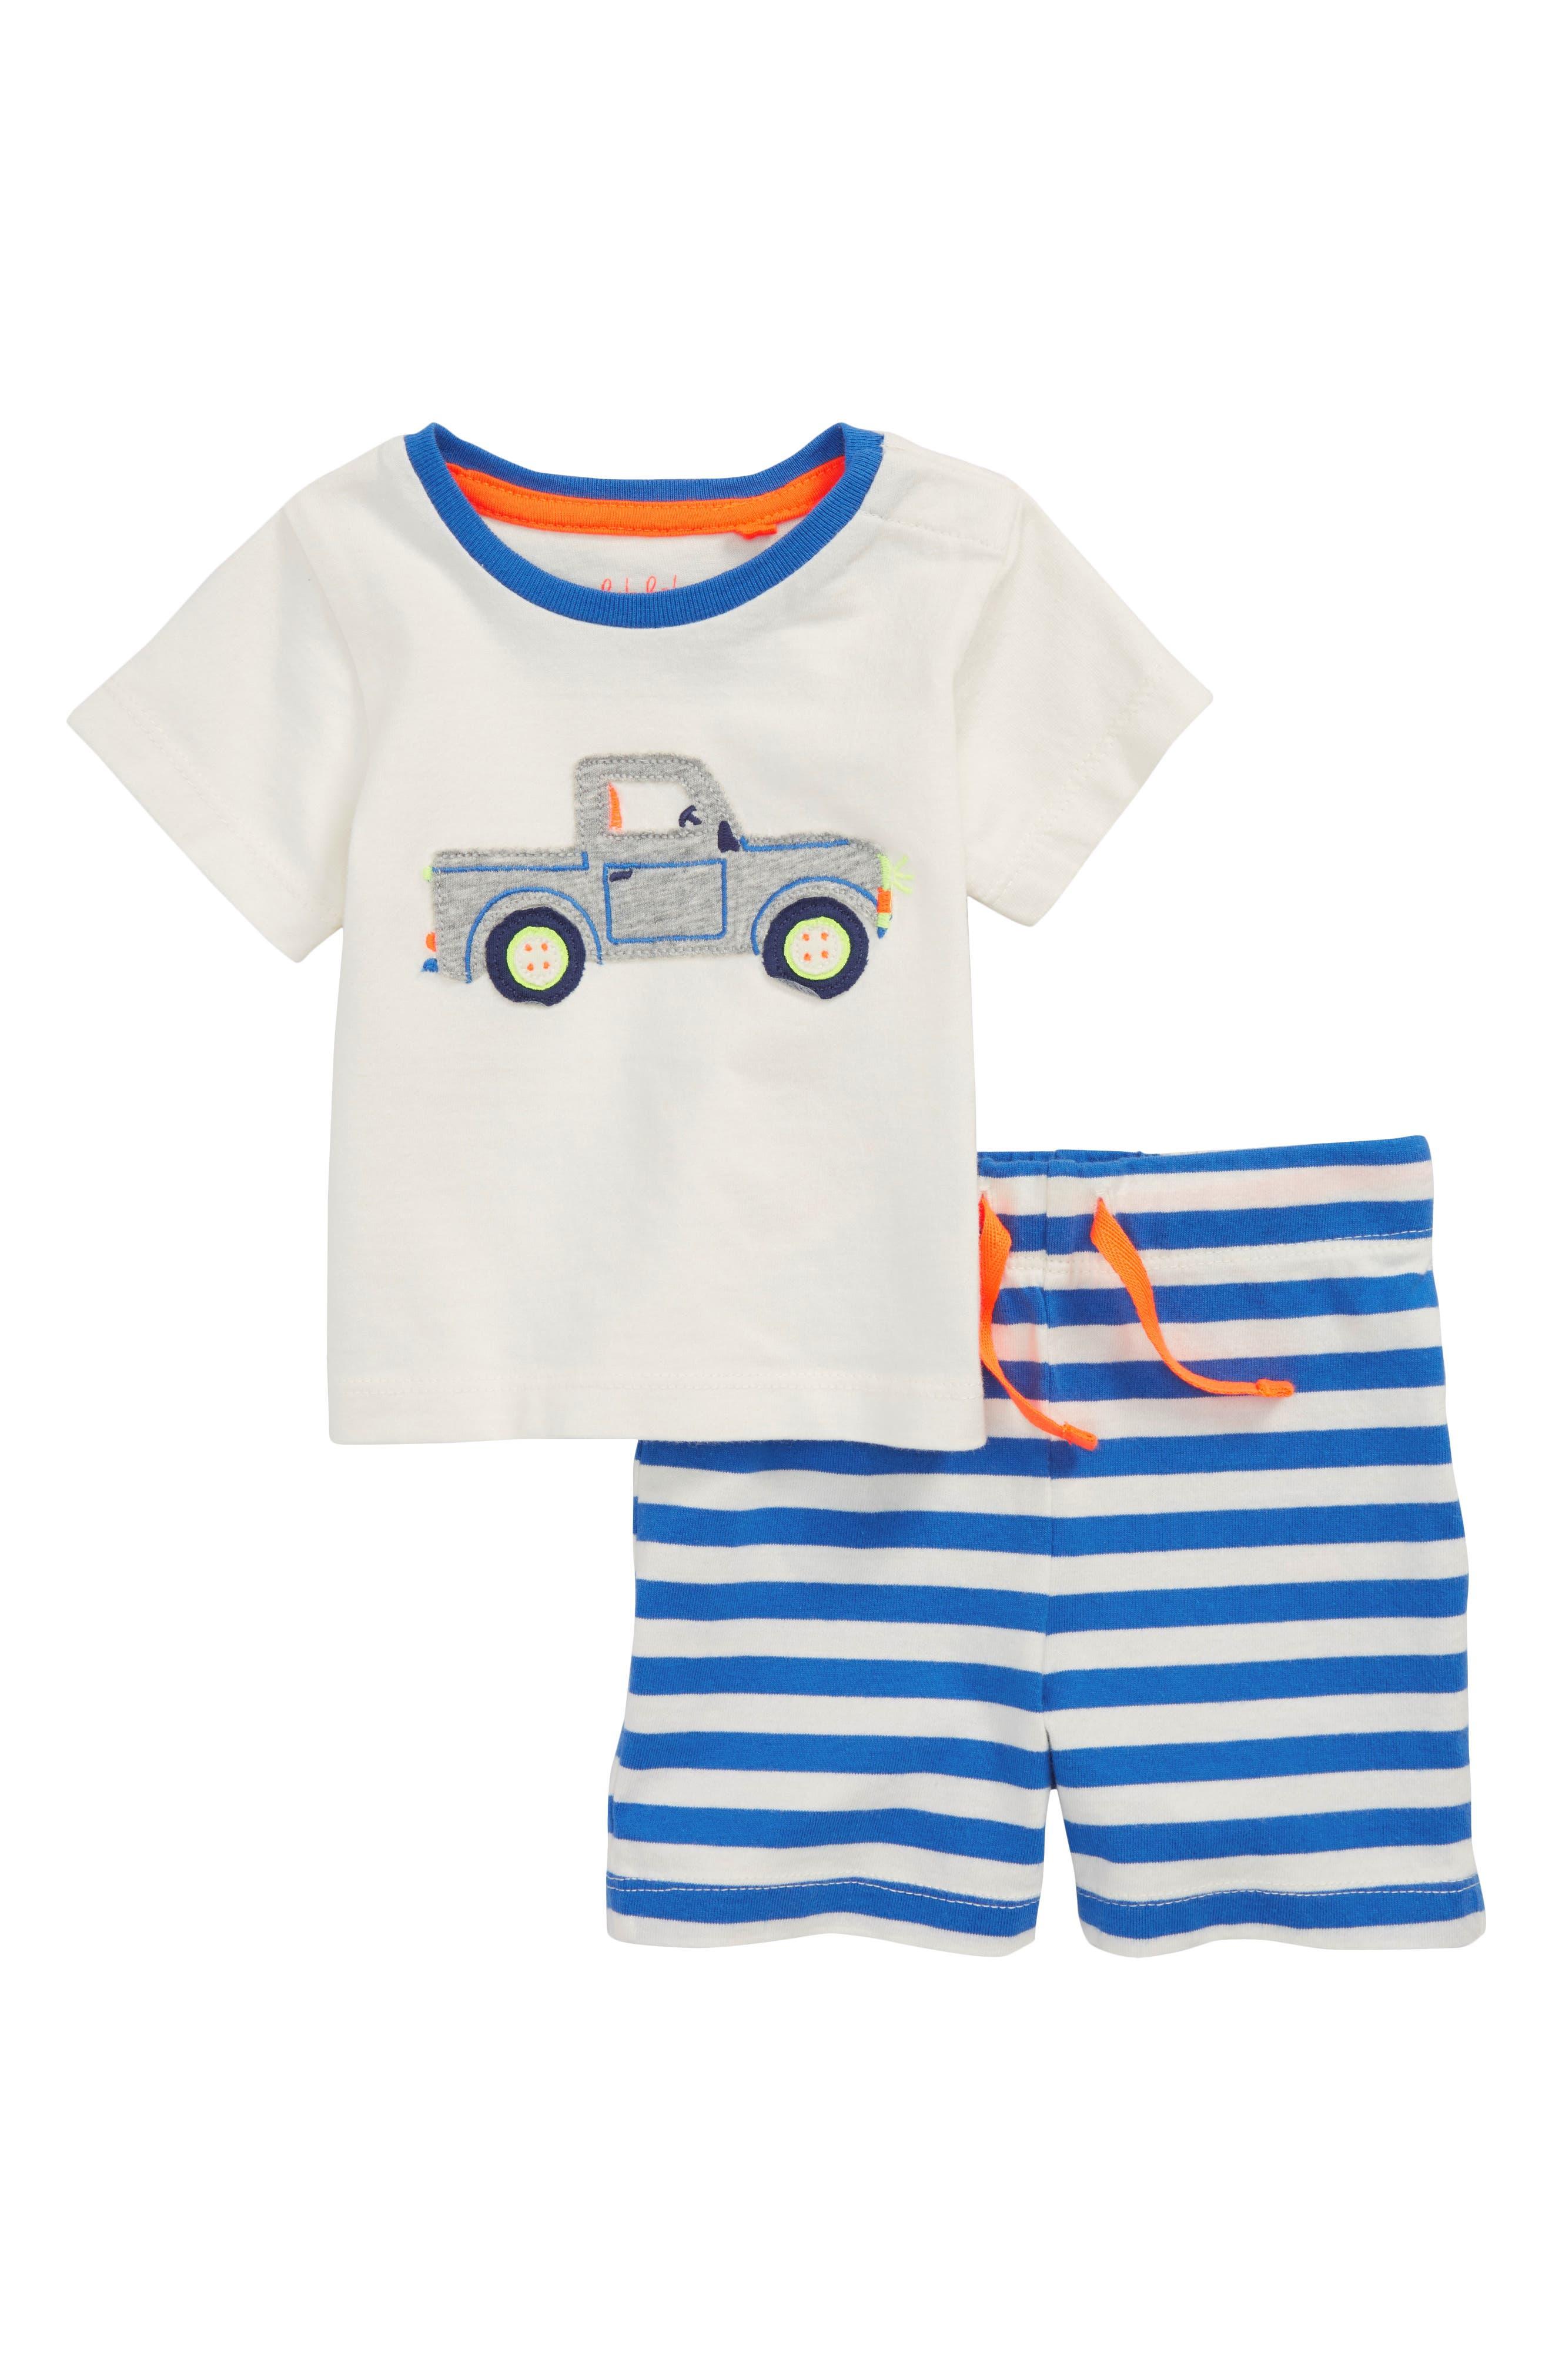 Fun Truck Appliqué T-Shirt & Shorts Set,                             Main thumbnail 1, color,                             904